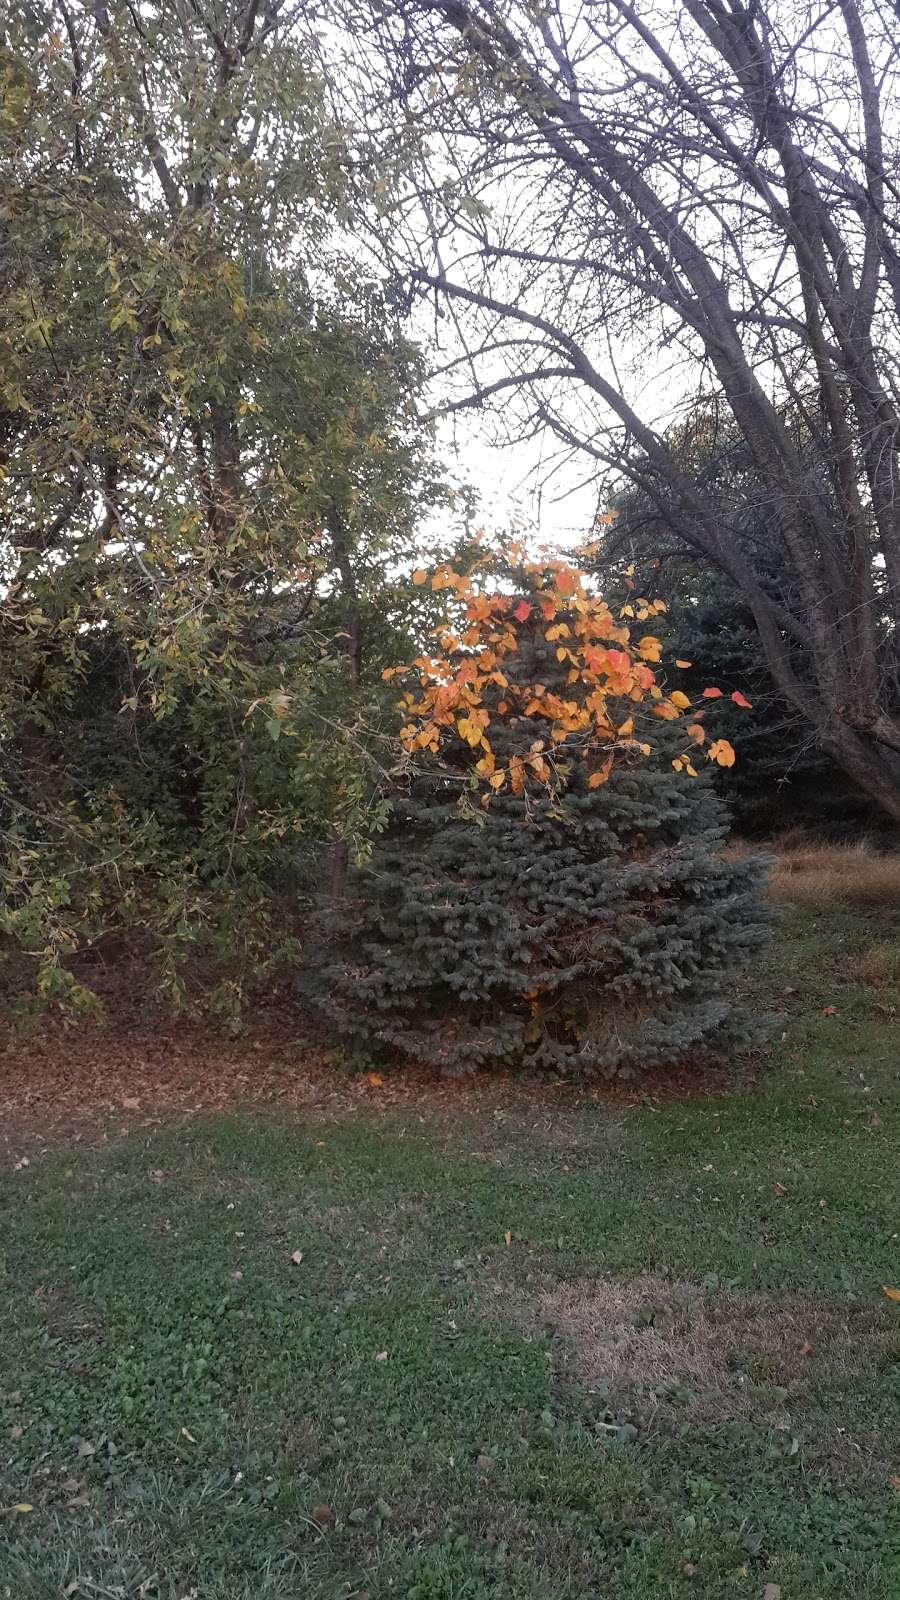 Golden Spa - spa  | Photo 9 of 10 | Address: 2024 Sullivan Trail, Easton, PA 18040, USA | Phone: (610) 879-0053